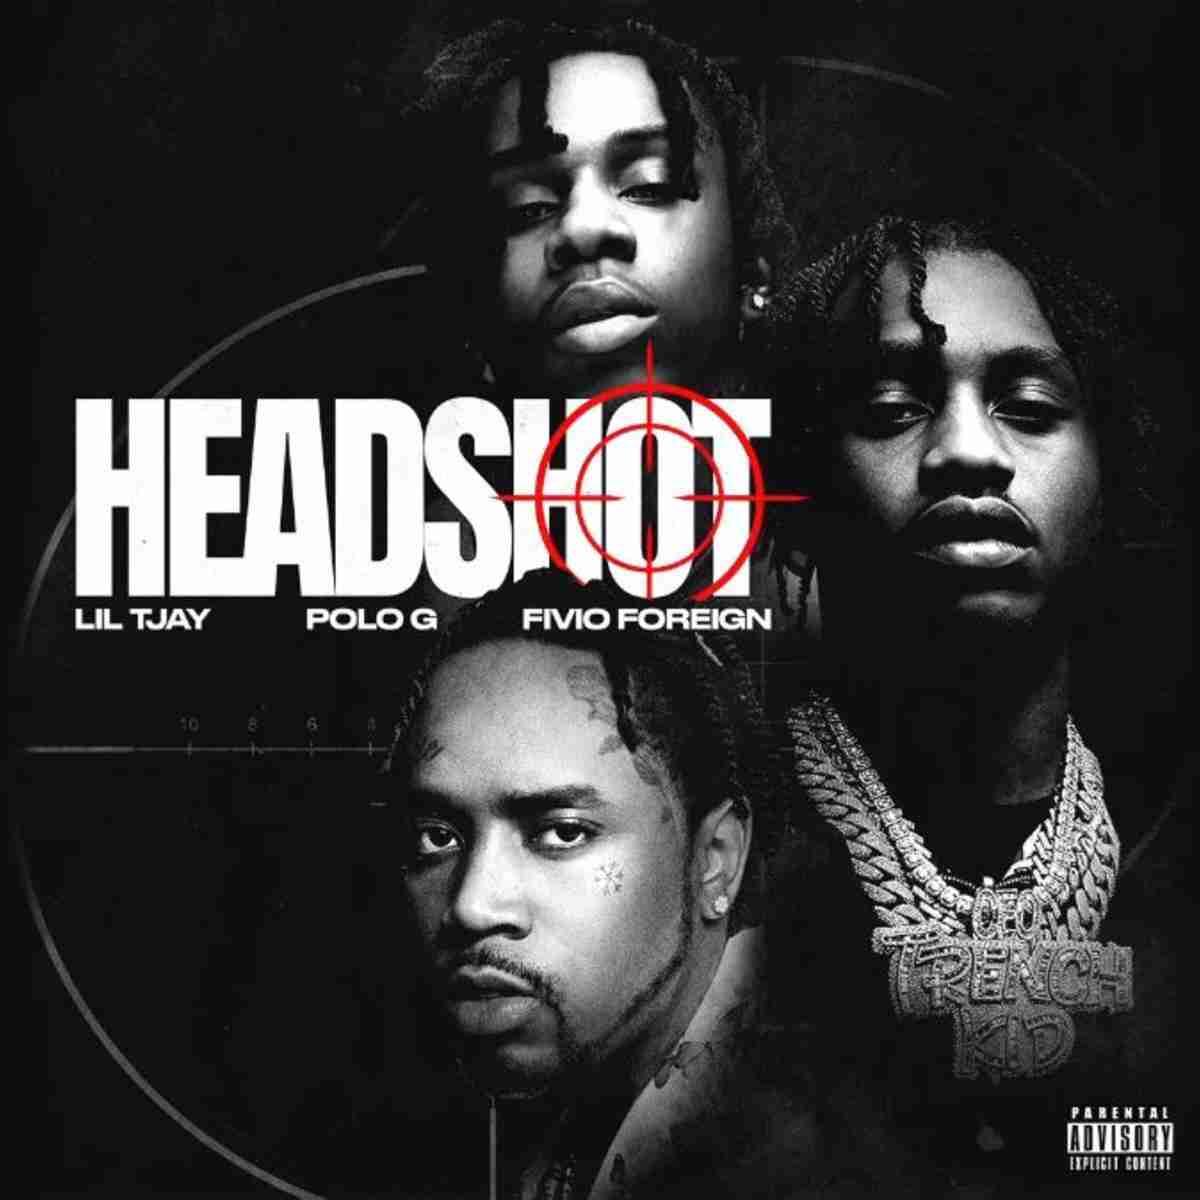 Lil Tjay – Headshot Ft. Polo G & Fivio Foreign